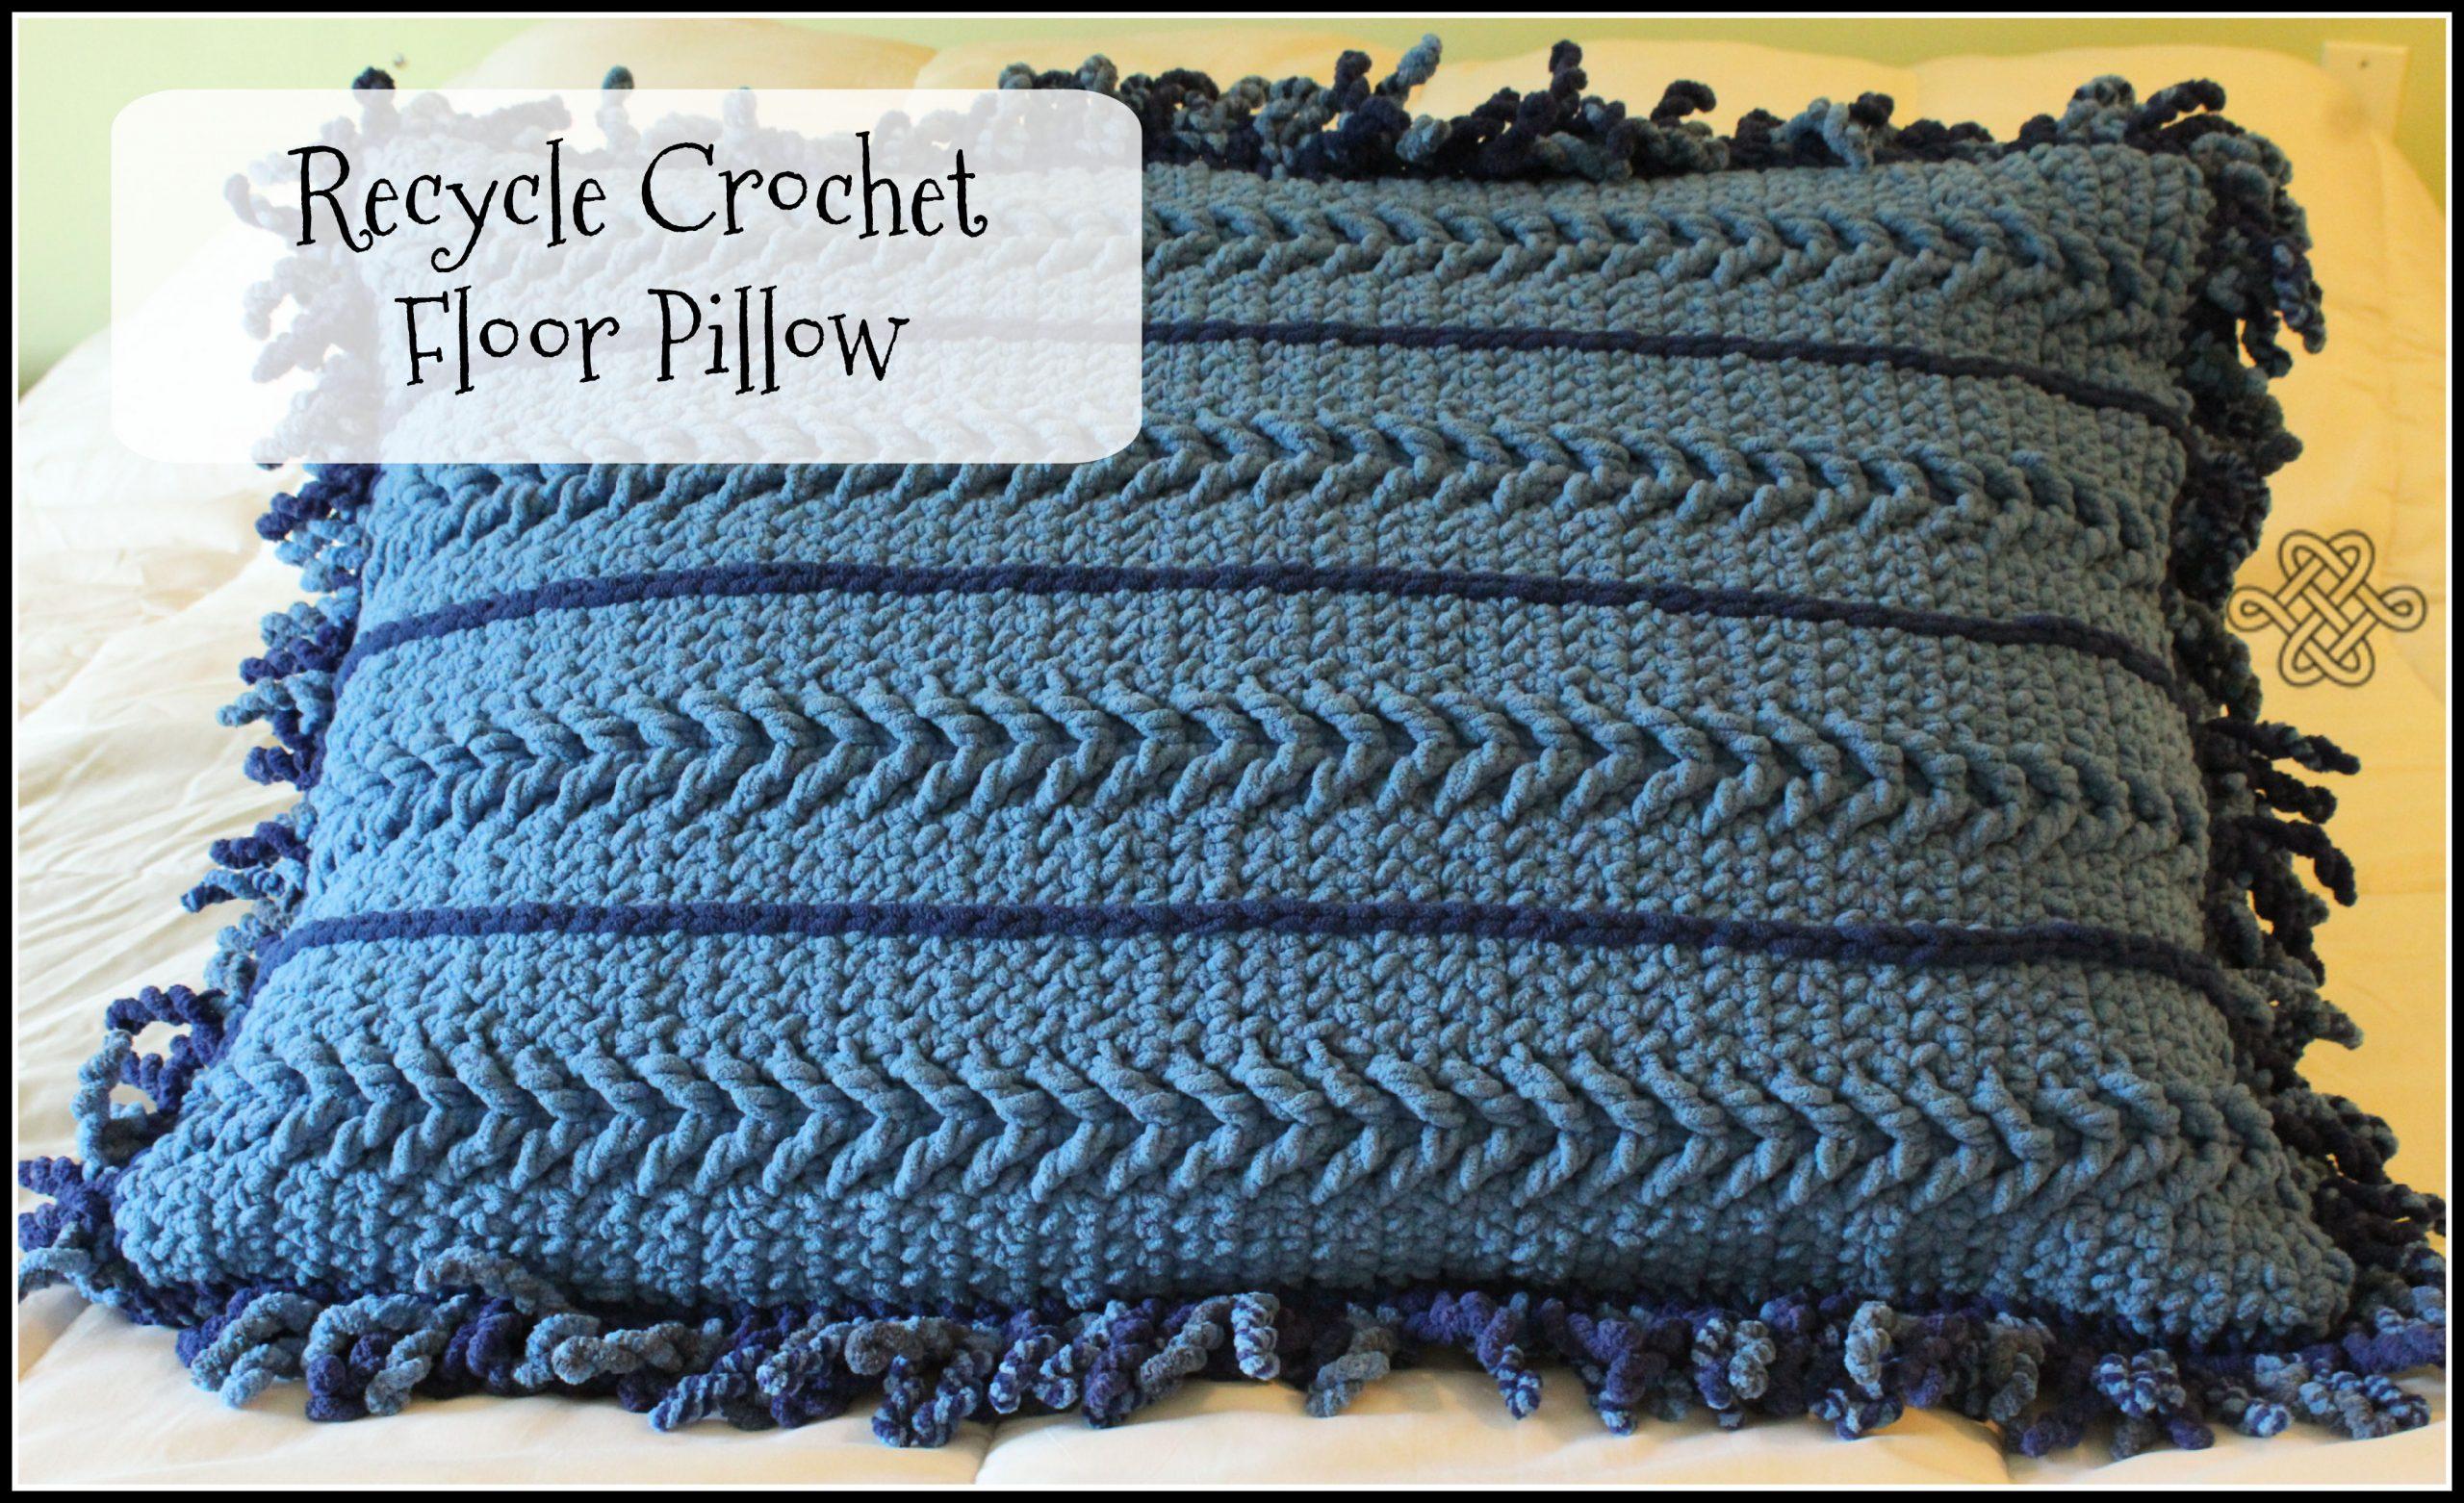 crocheted floor pillow with blanket yarn